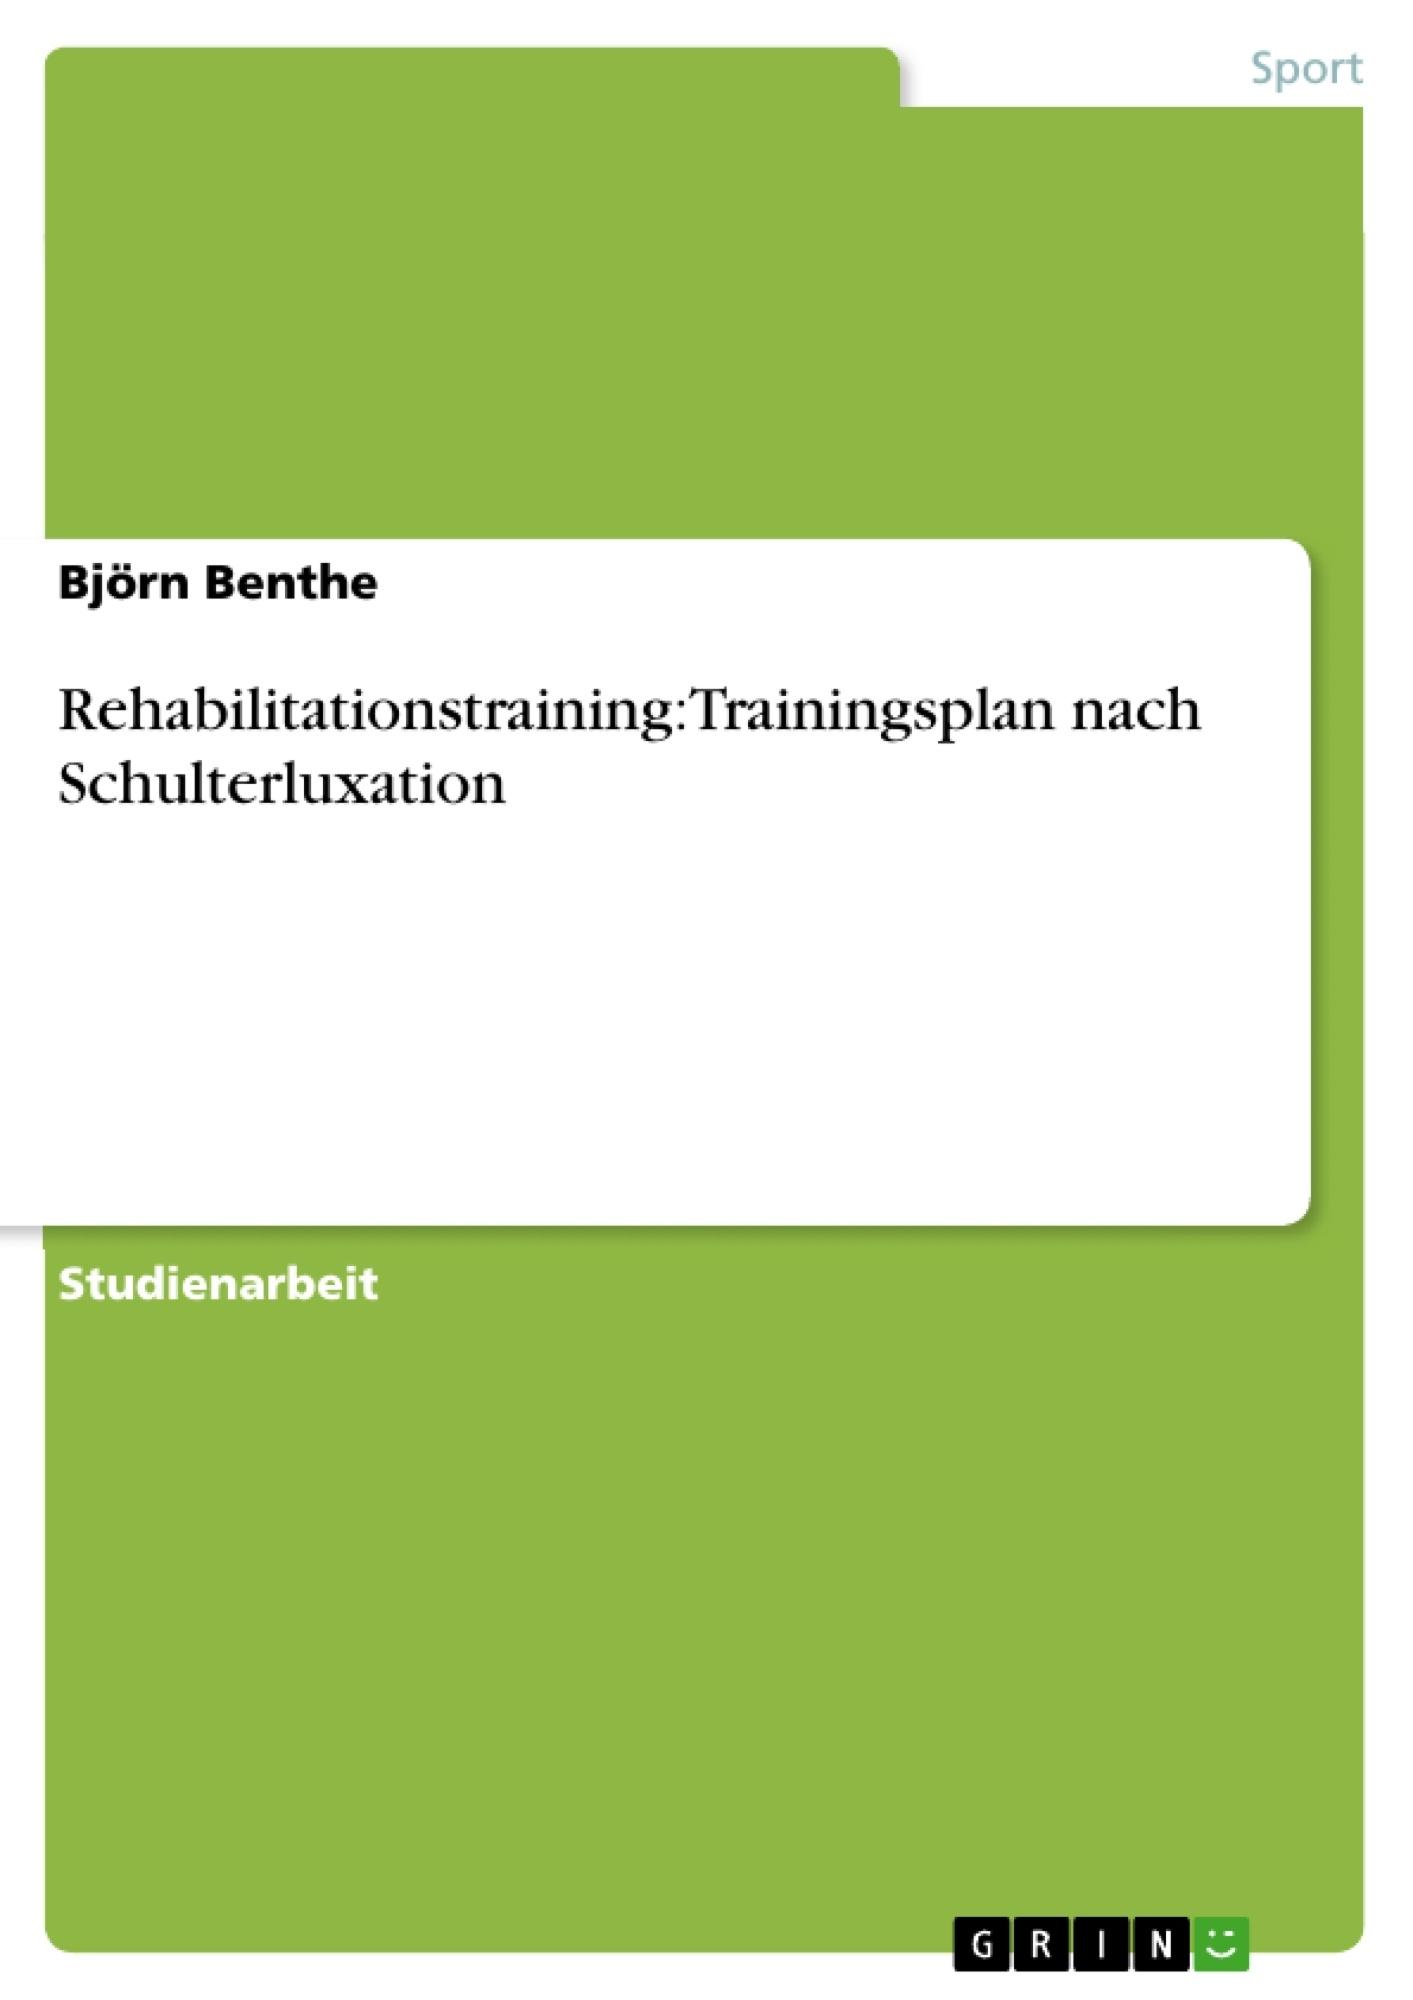 Titel: Rehabilitationstraining: Trainingsplan nach Schulterluxation